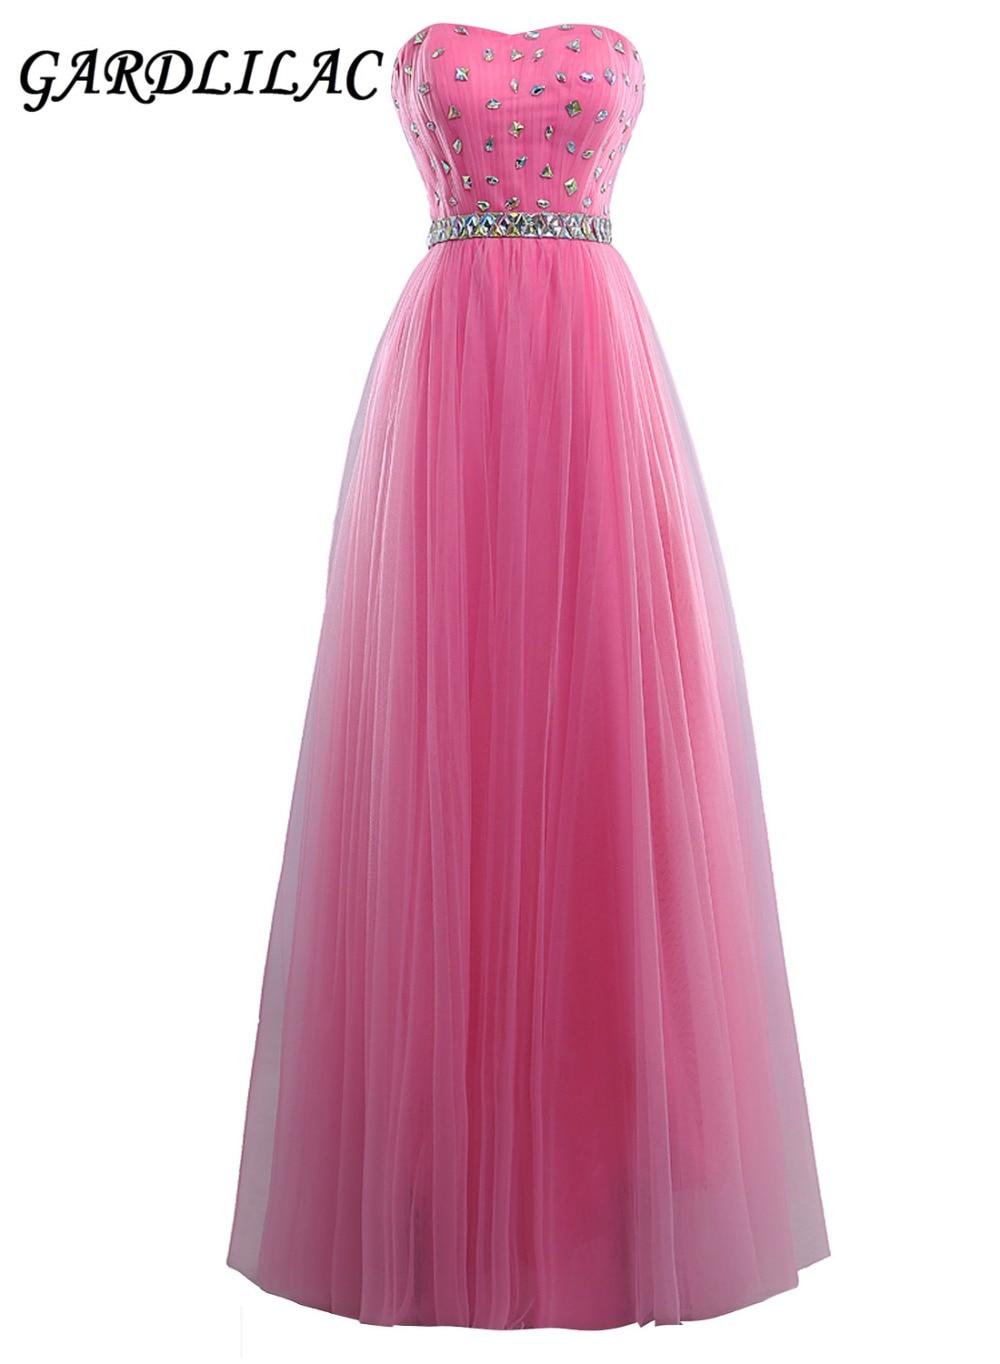 Pakaian tak bertali bahu tak bertali bahu panjang Baru 2019 Plus saiz gaun pesta perkahwinan tulle dengan manik pembantu rumah gaun prom majlis